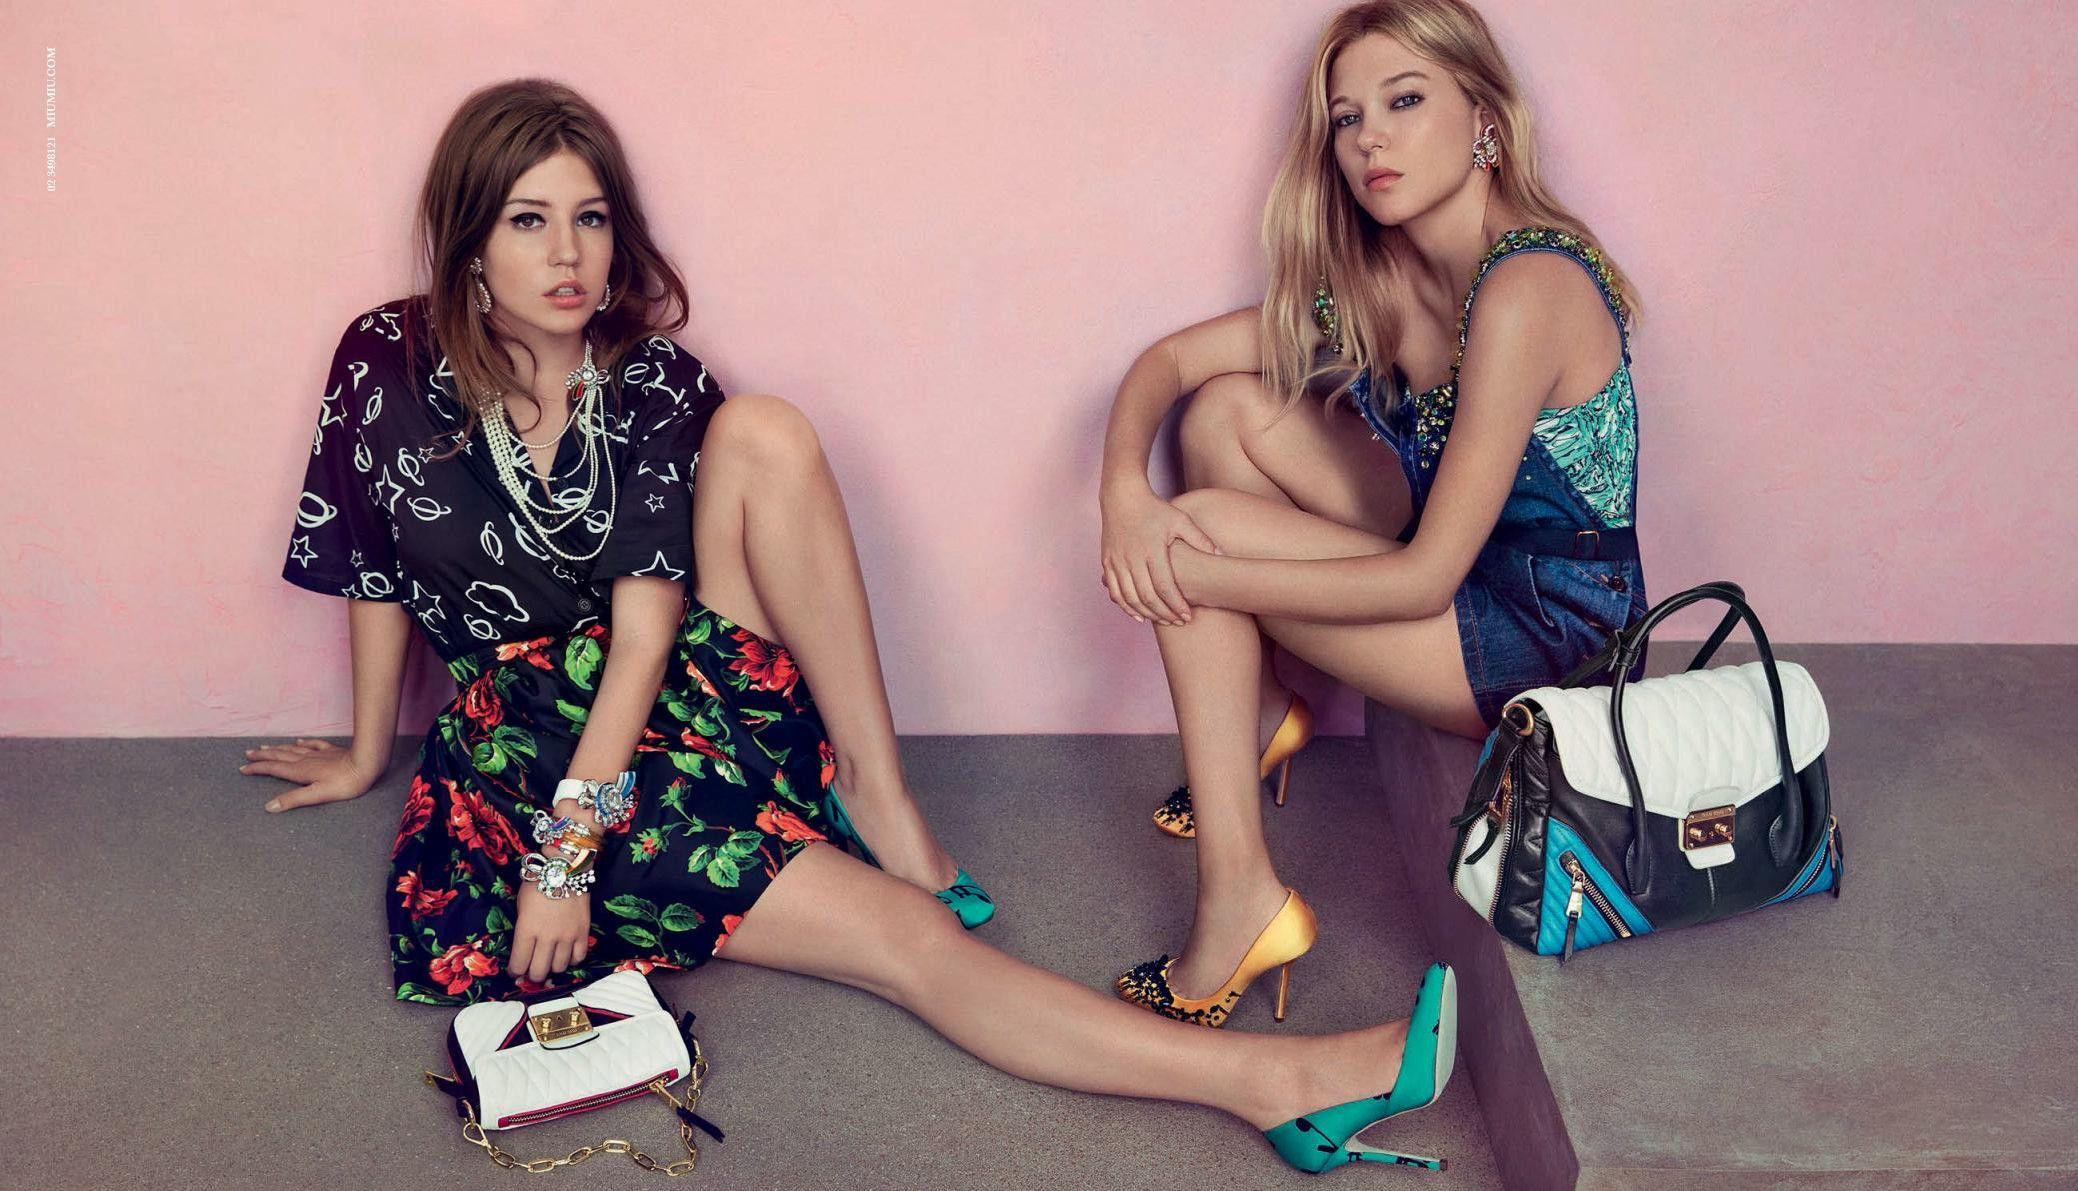 Lea Seydoux And Adele Exarchopoulos For Miu Miu Resort Fashion